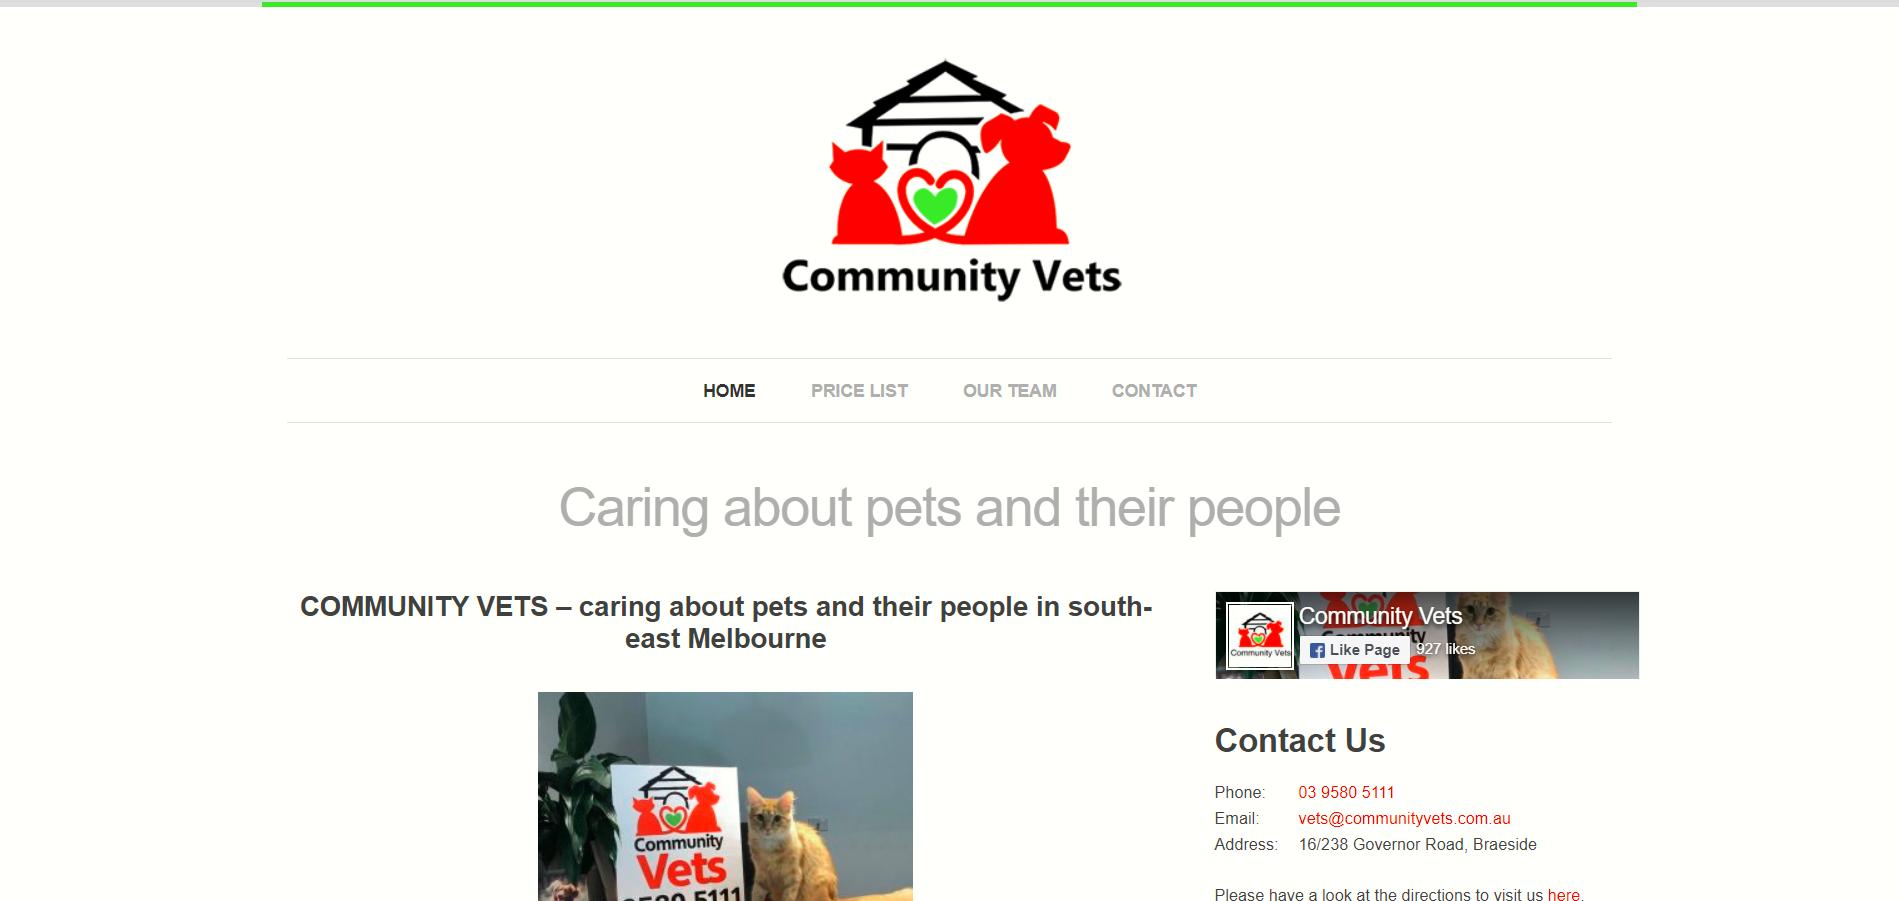 Community Vets